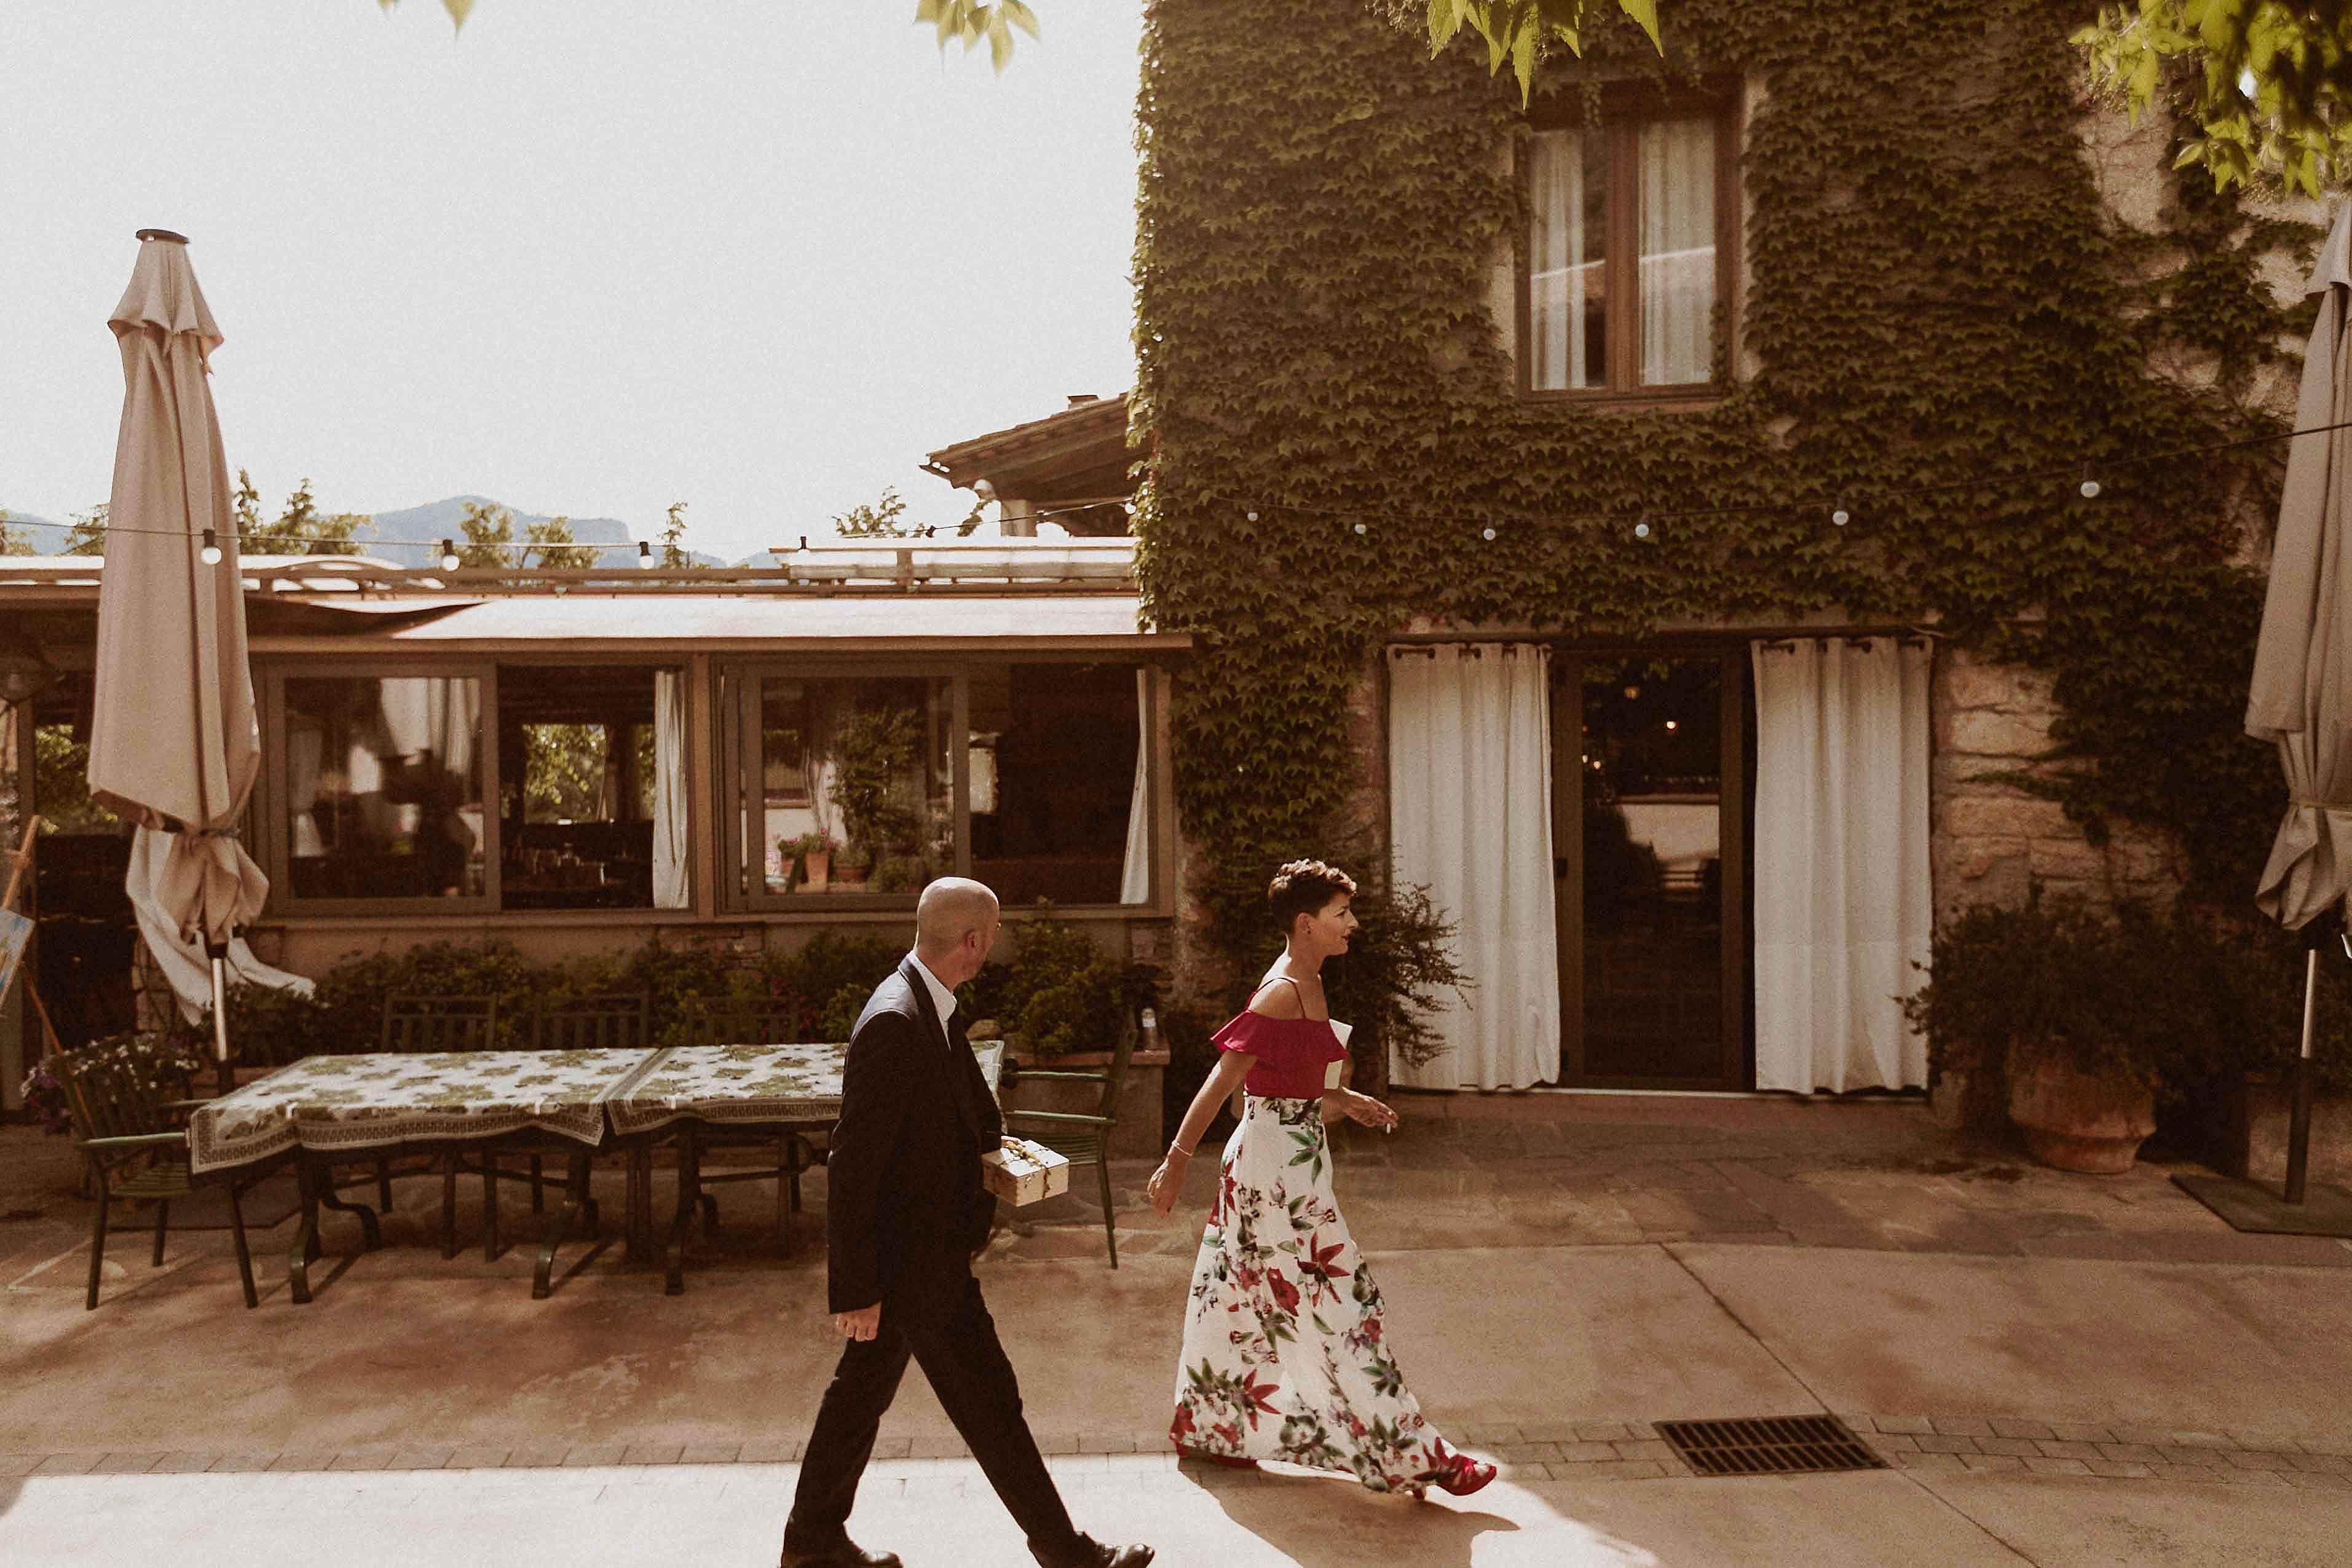 Boda rústica en la montaña. fotgrafo de bodas barcelona_026